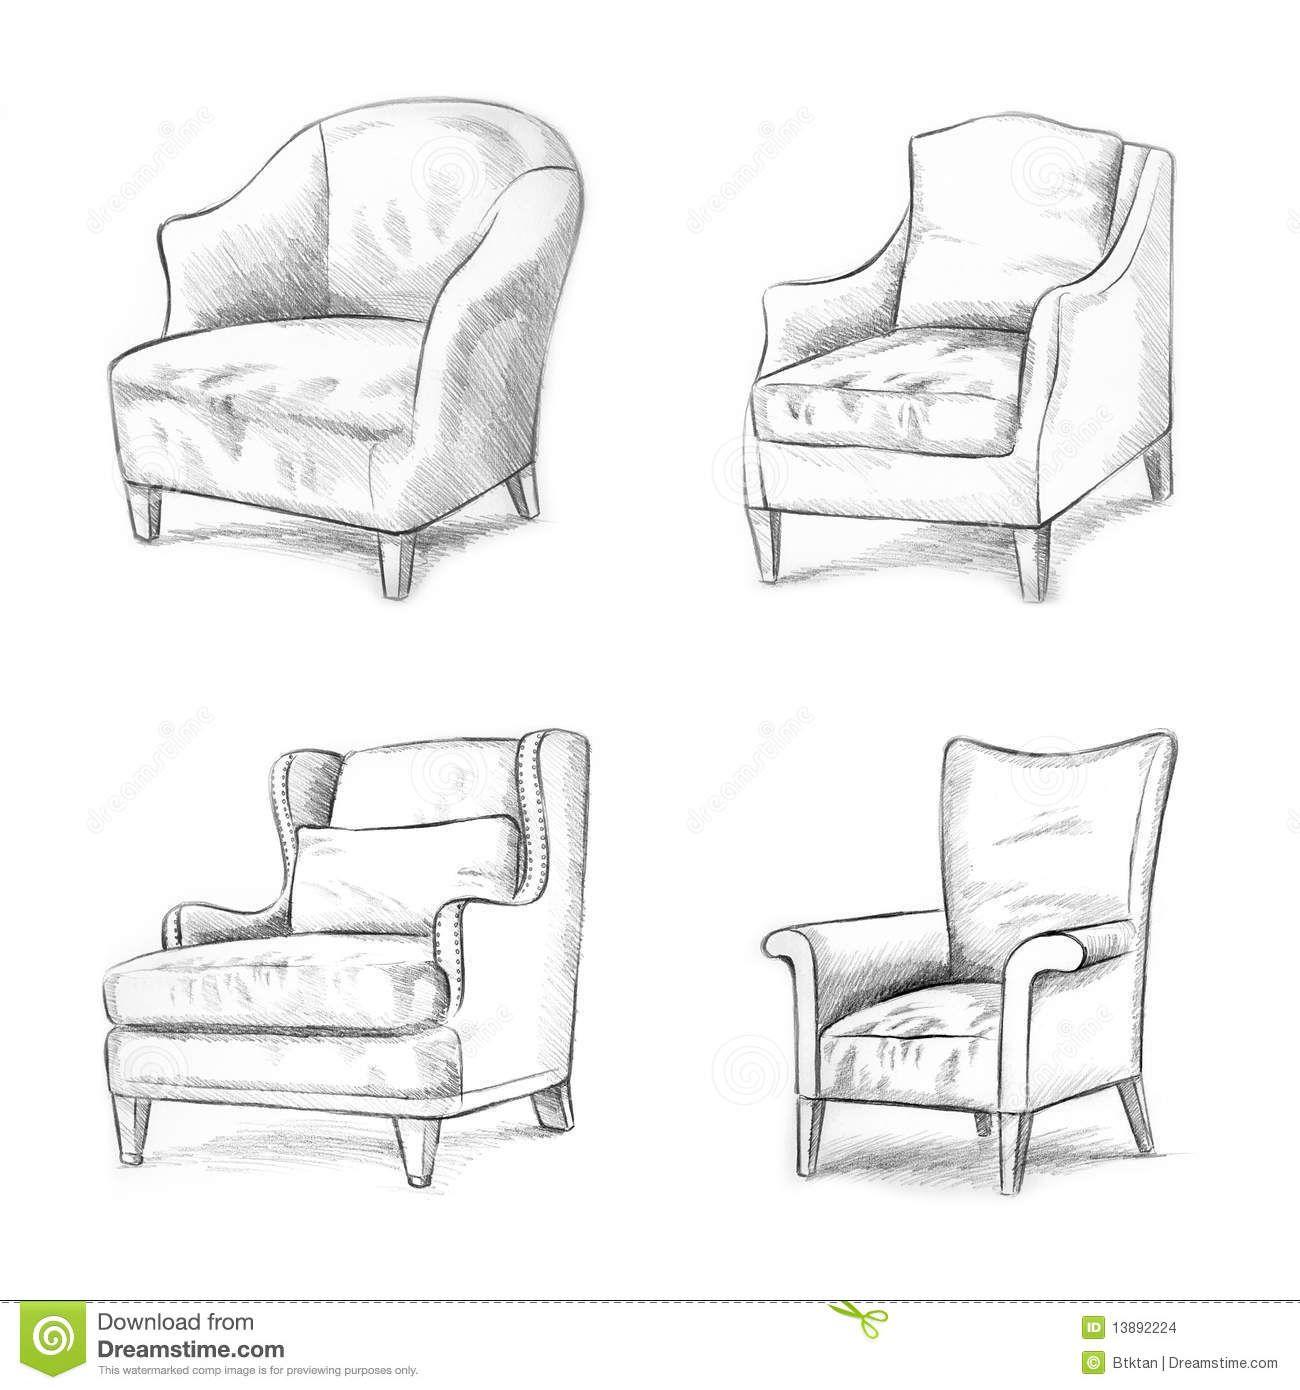 Image Result For Sketching Of A Chair Eskizy Interernyh Dizajnov Dizajn Interera Dizajn